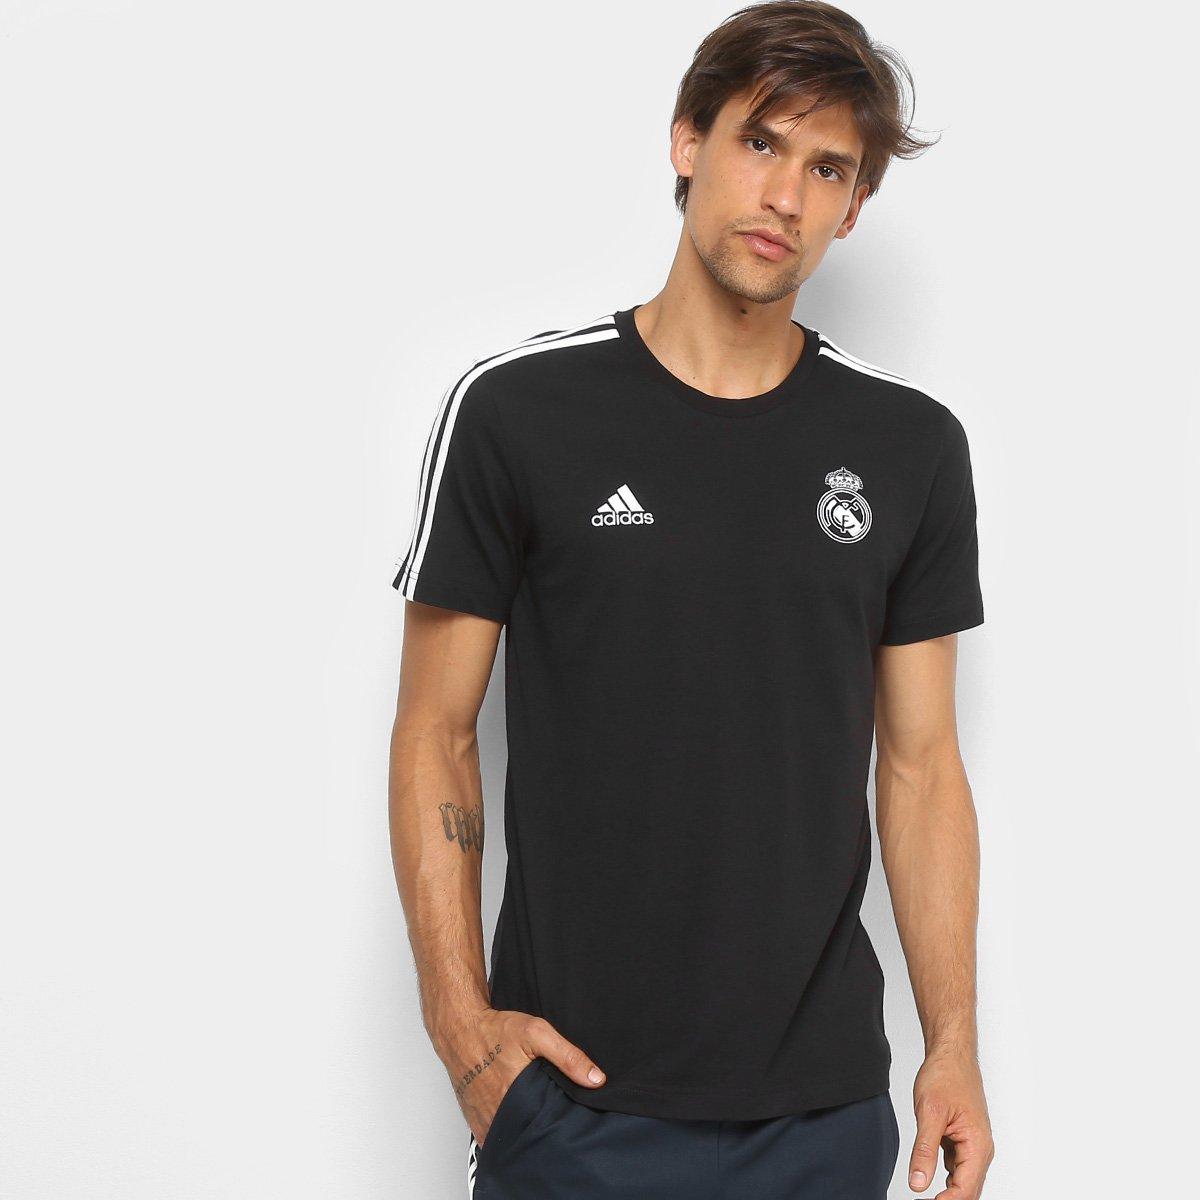 af81d9dc64 Camiseta Real Madrid 3Stripes Adidas Masculina